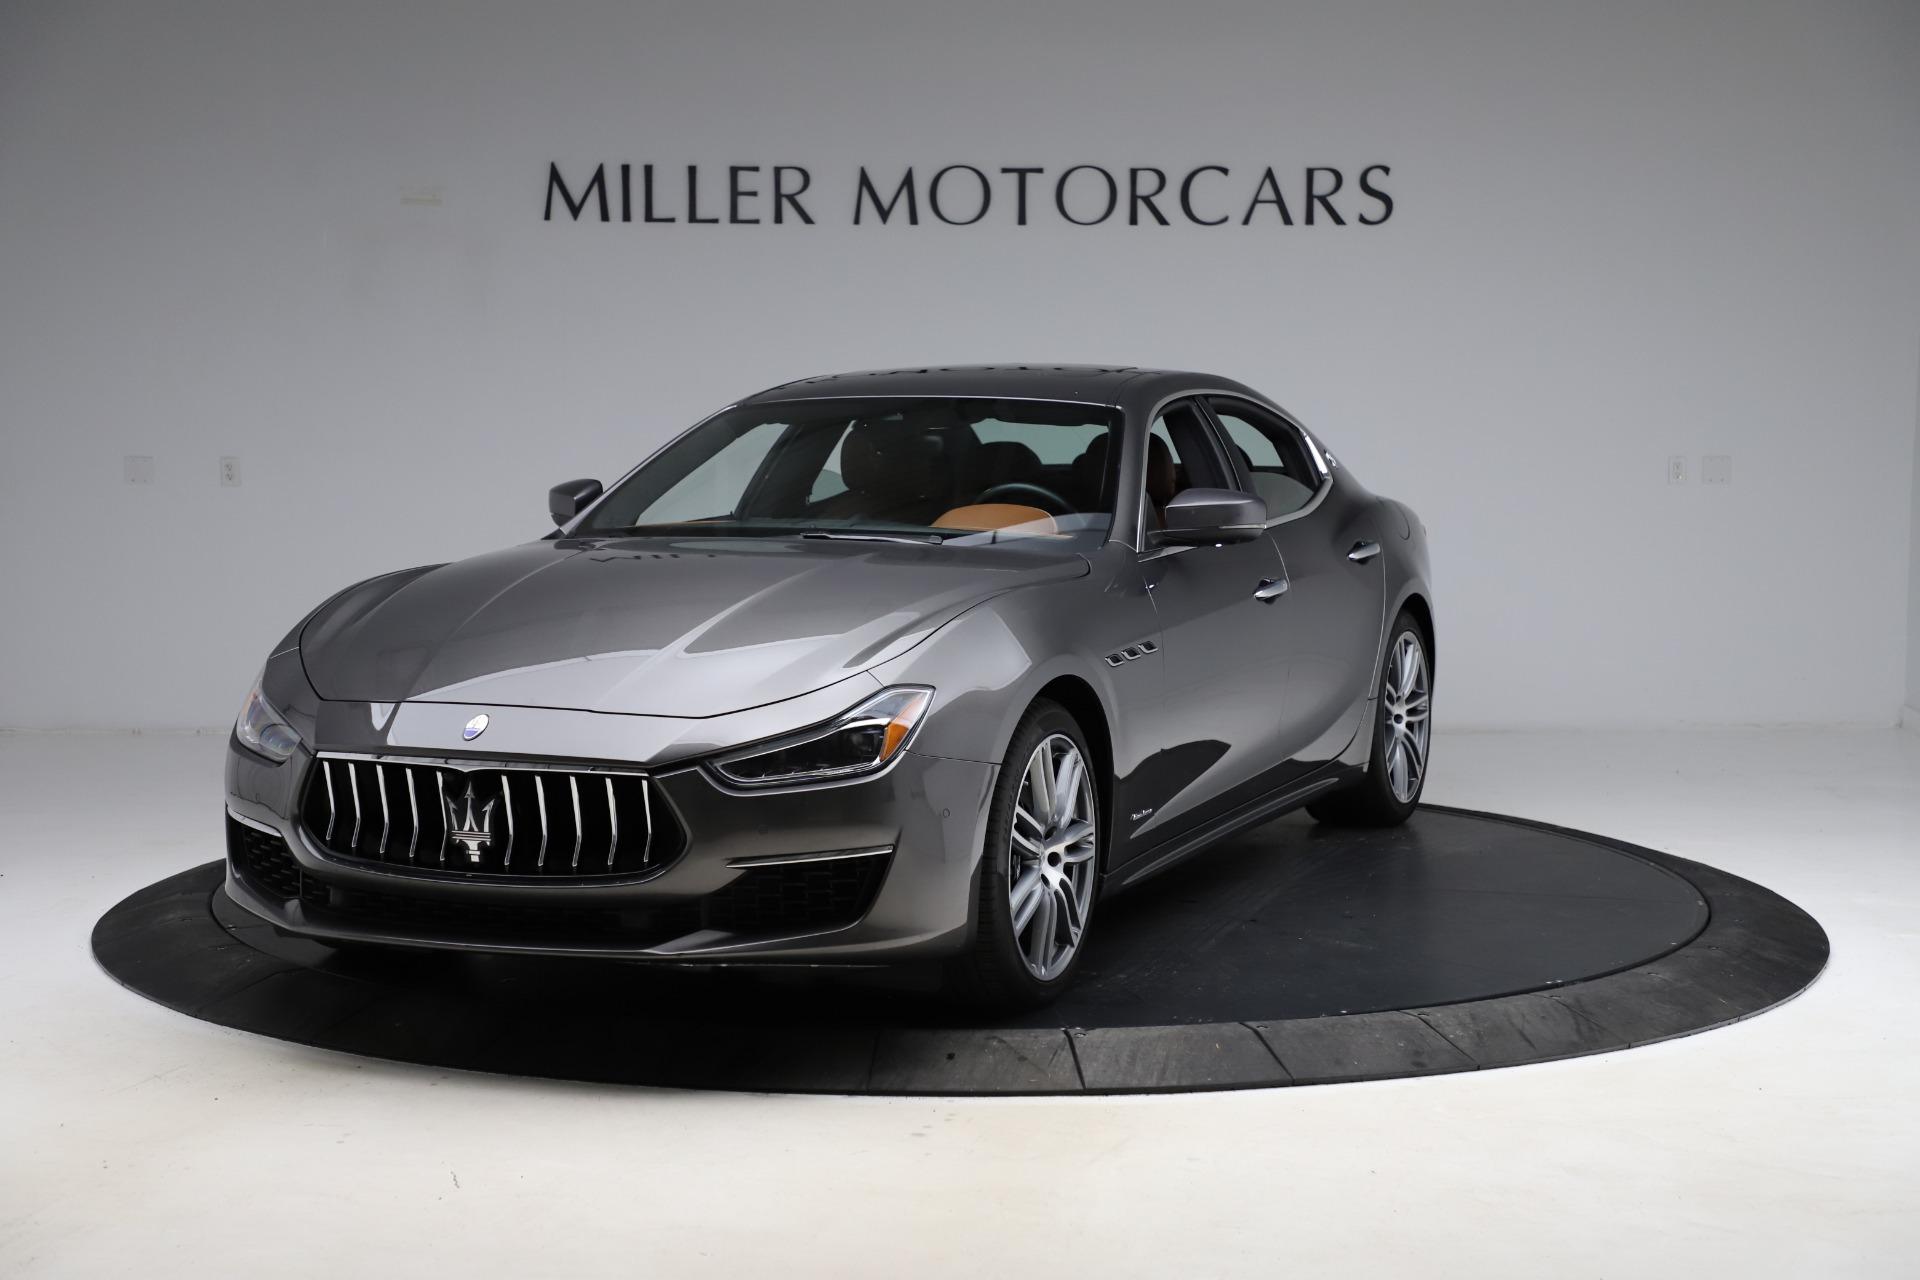 Used 2018 Maserati Ghibli SQ4 GranLusso for sale Call for price at Maserati of Greenwich in Greenwich CT 06830 1